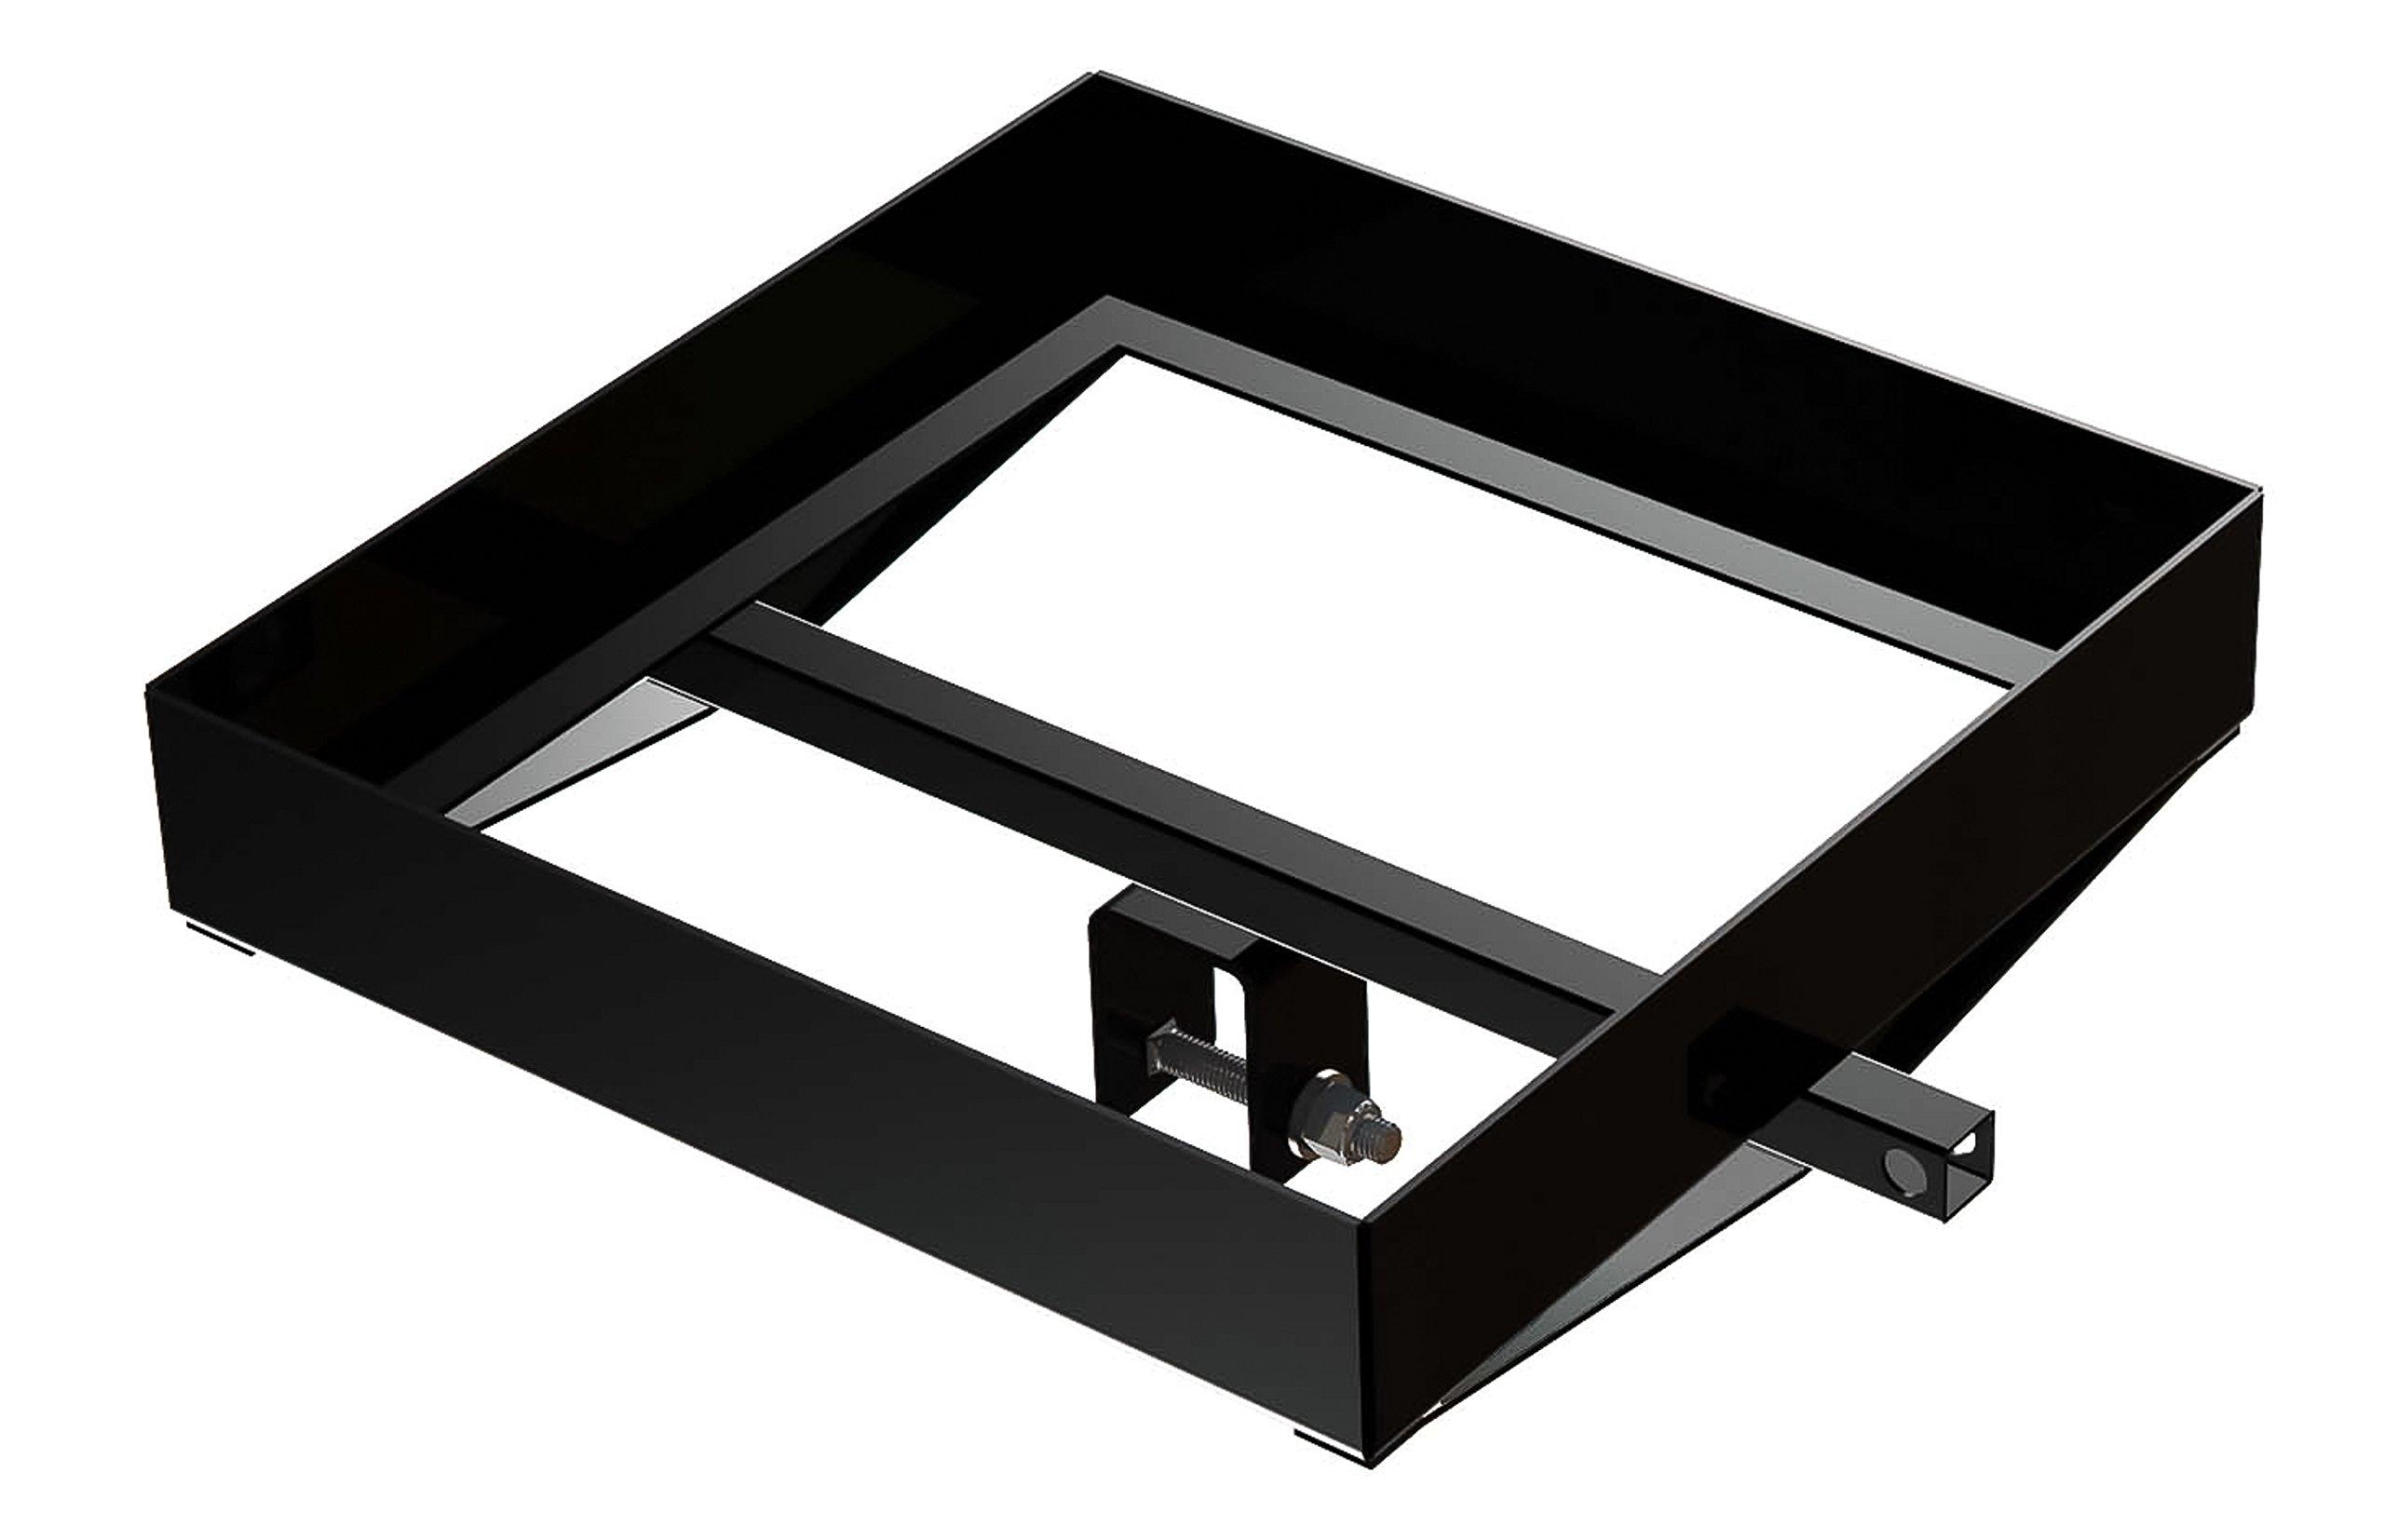 Black Boar UTV Basket for Adding Additional Weight to ATV Implements (66006) by Black Boar